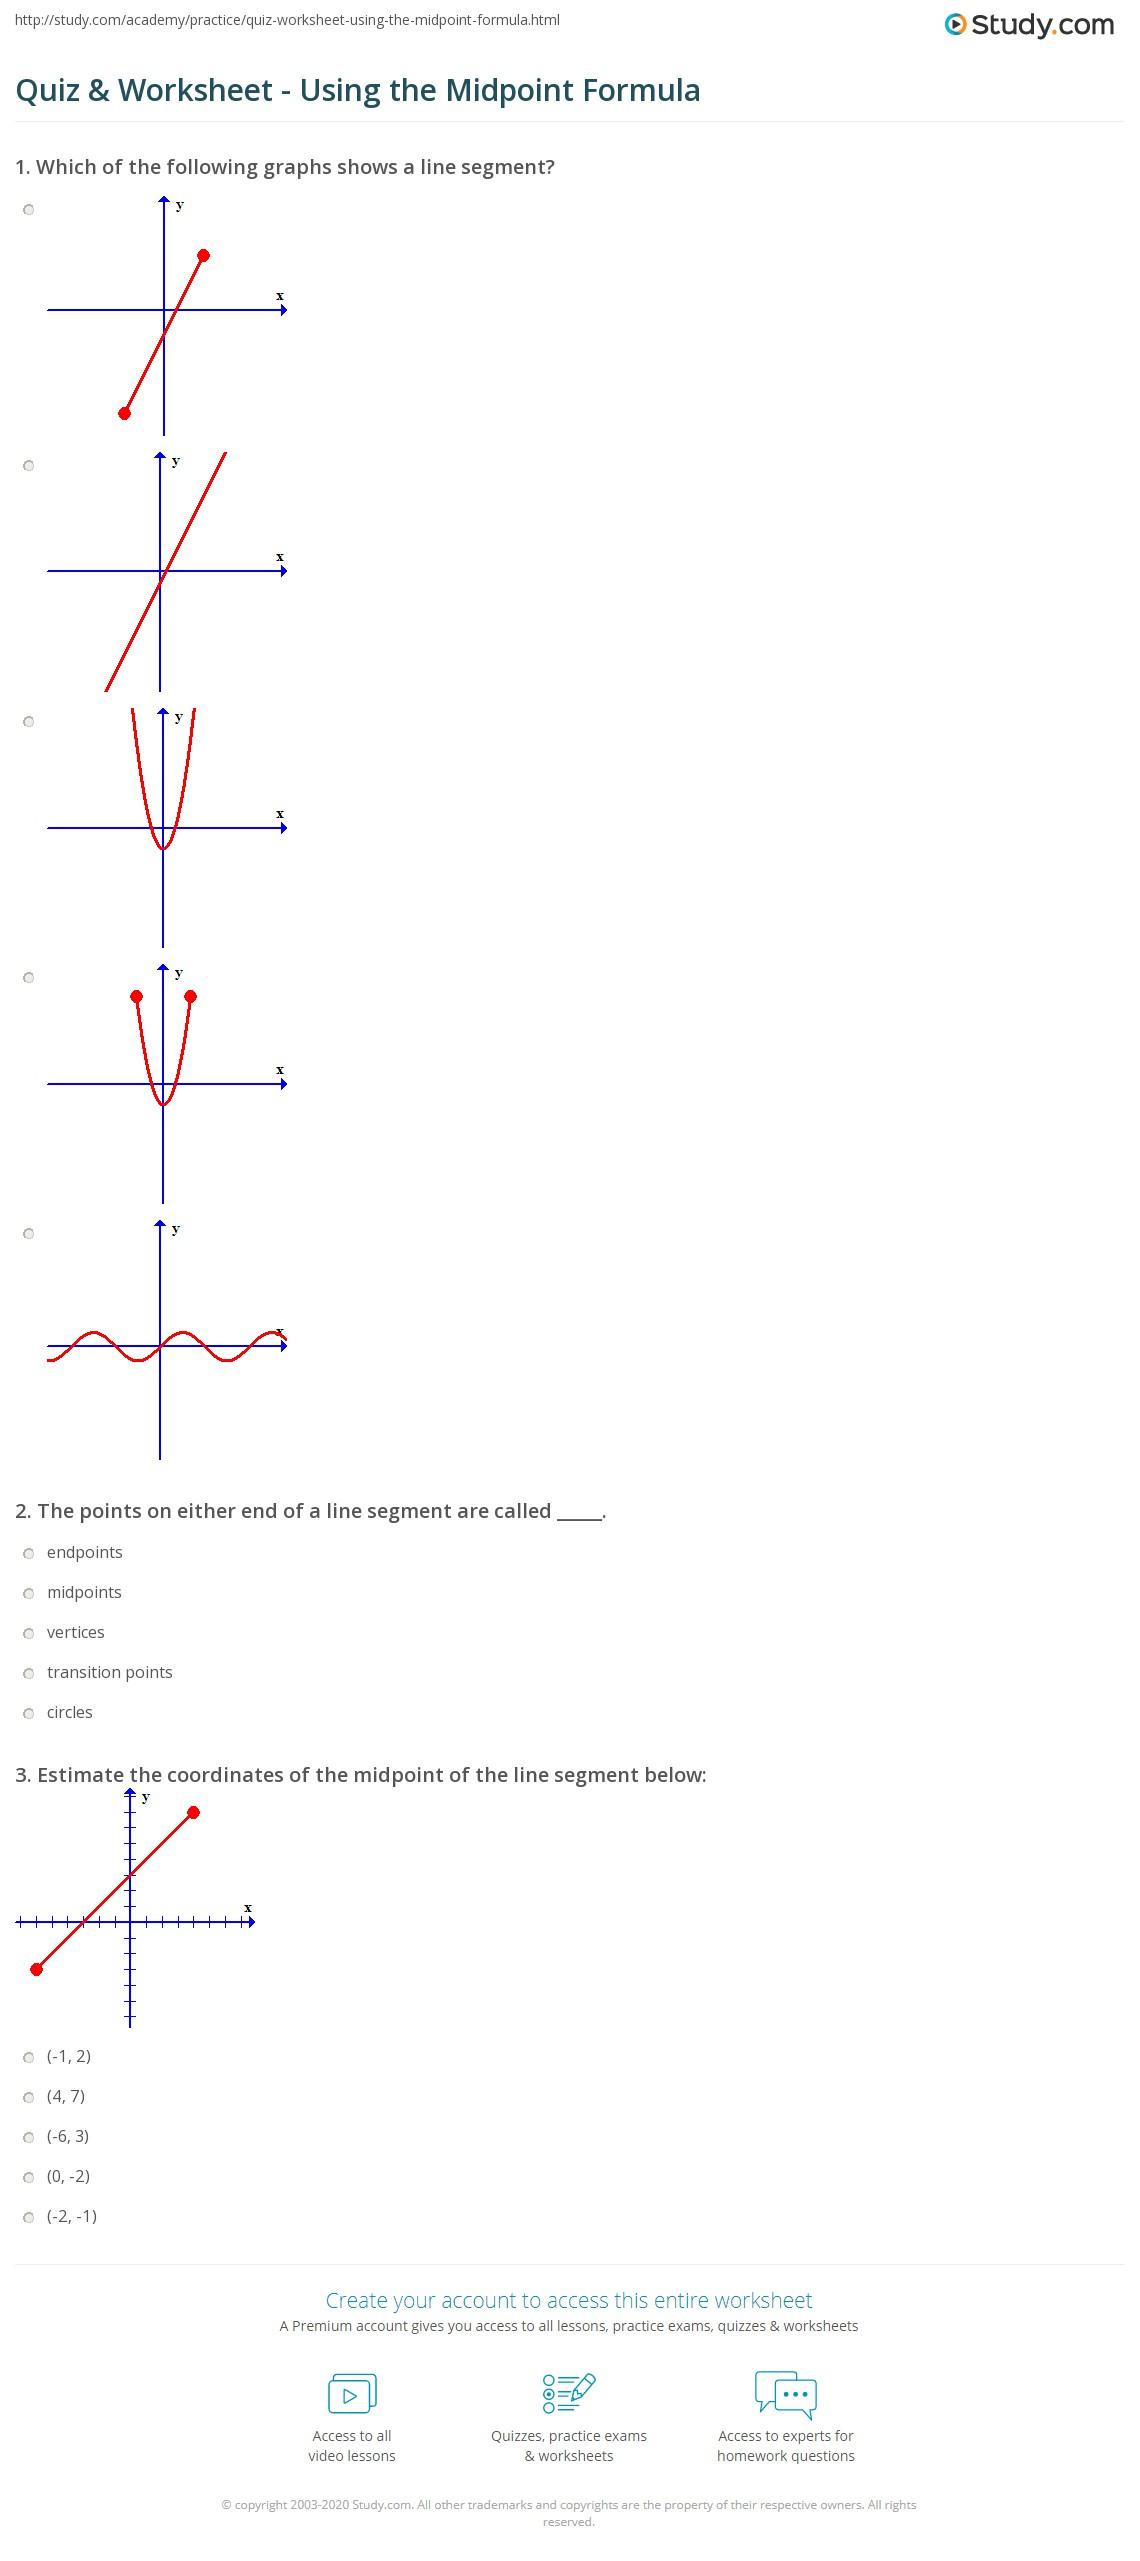 The Midpoint formula Worksheet Quiz & Worksheet Using the Midpoint formula